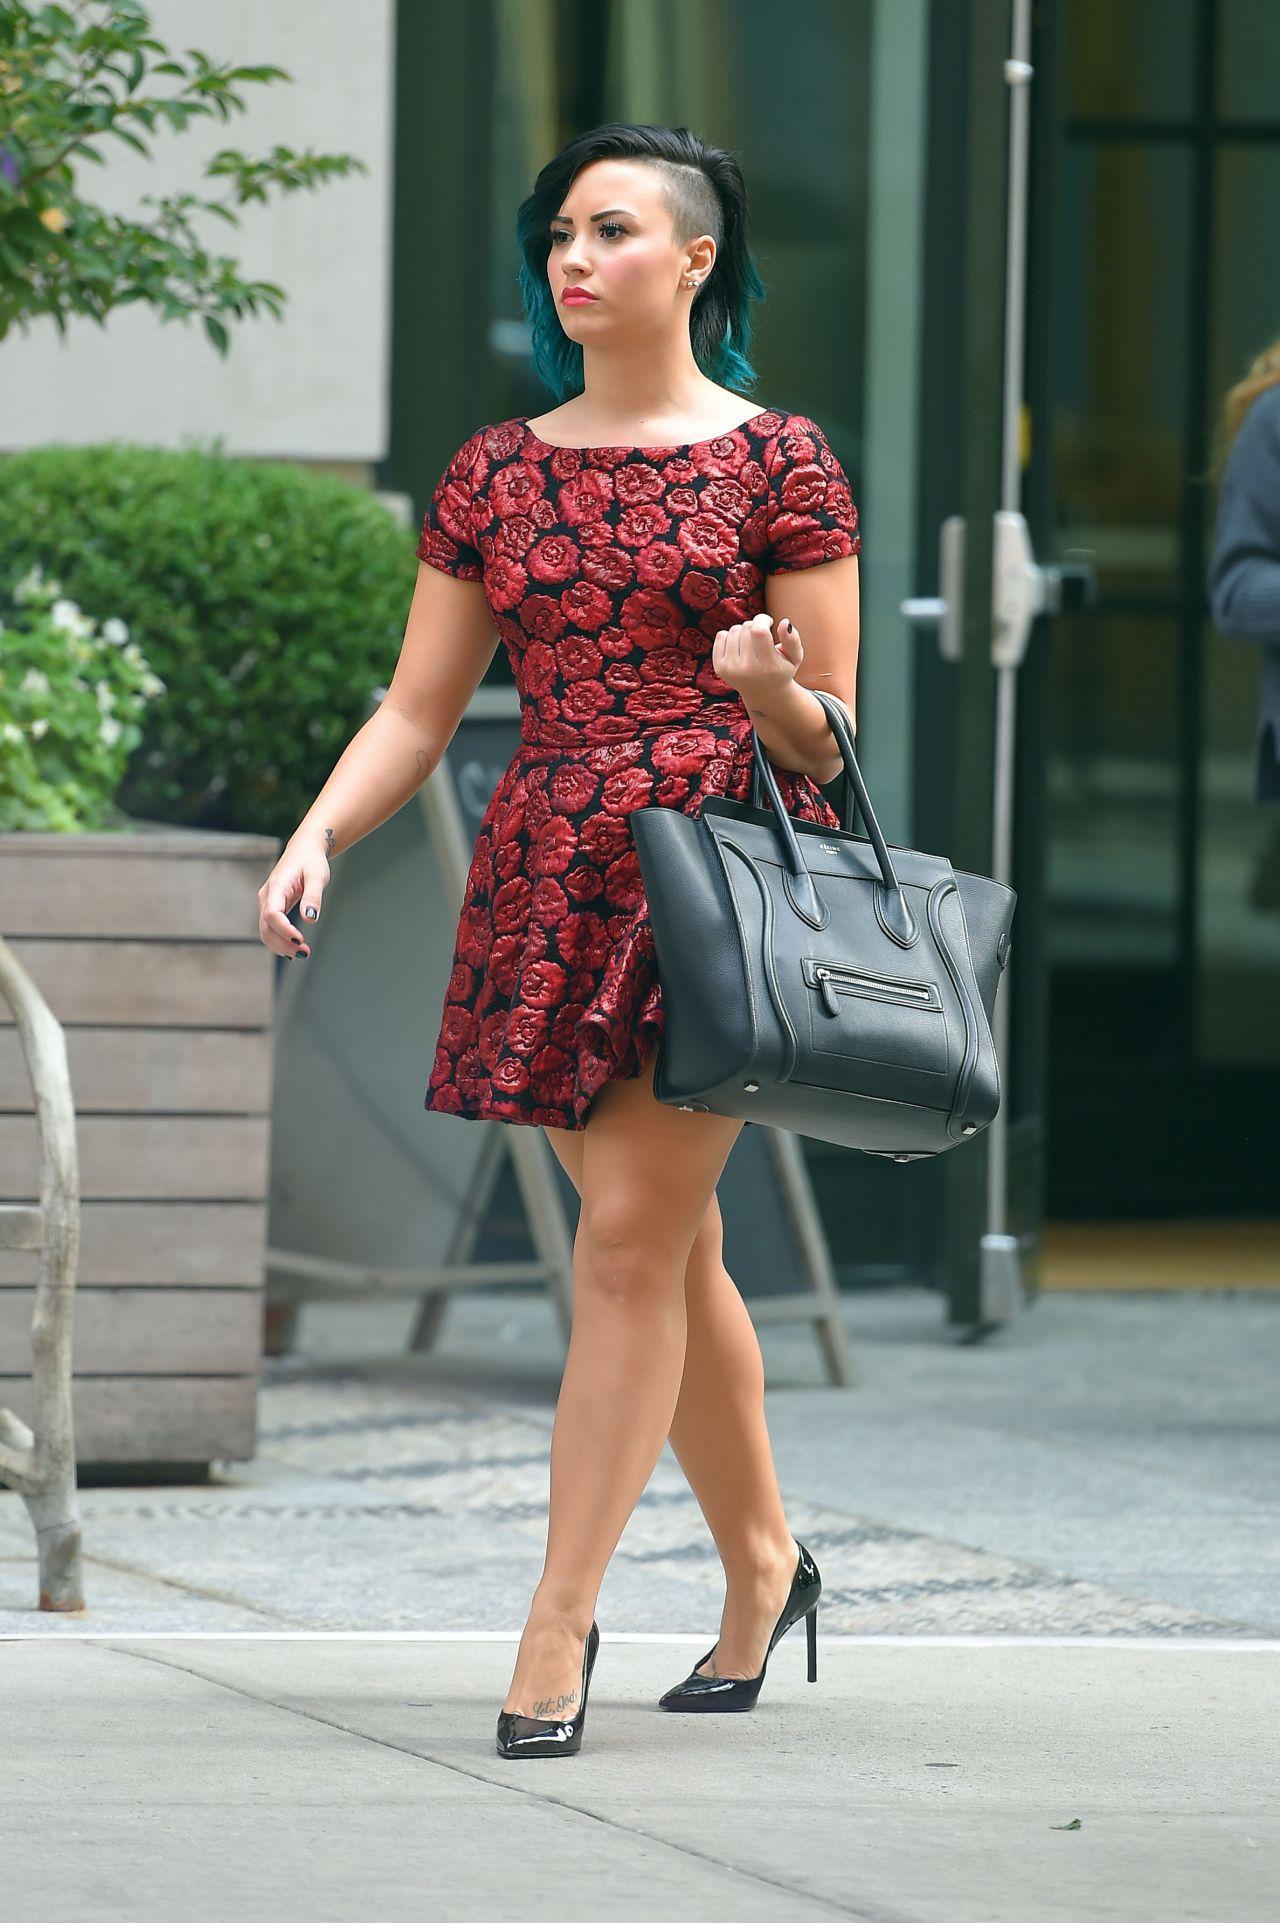 demi lovato in mini dress out in soho nyc october 2014